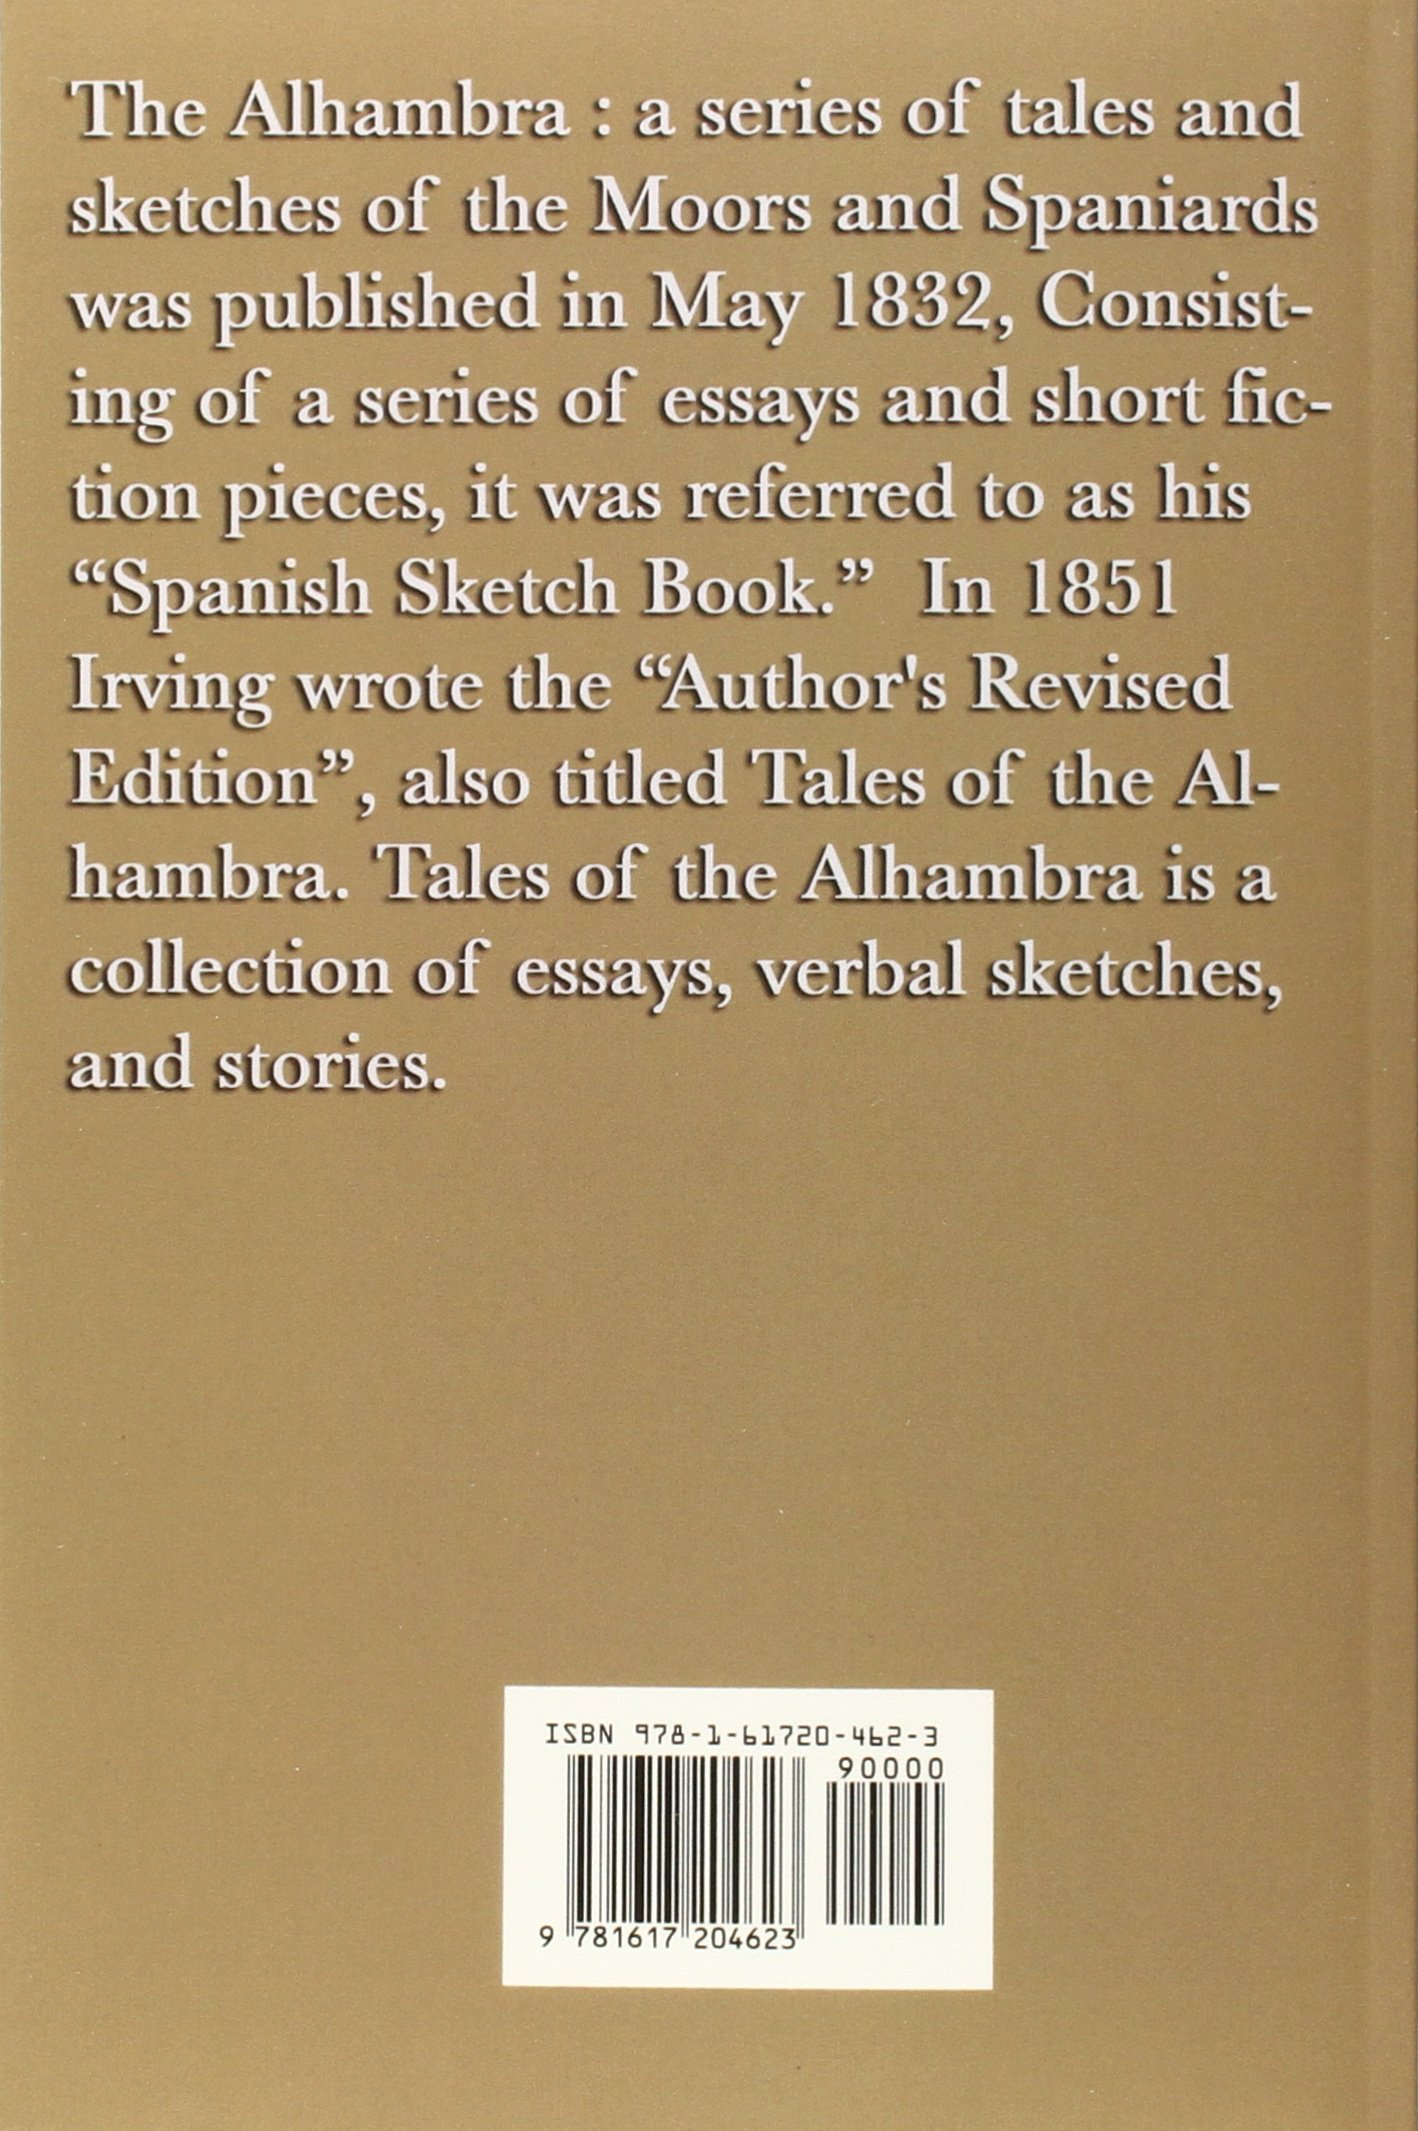 Amazon.com: Tales of the Alhambra (9781617204623): Washington irving: Books